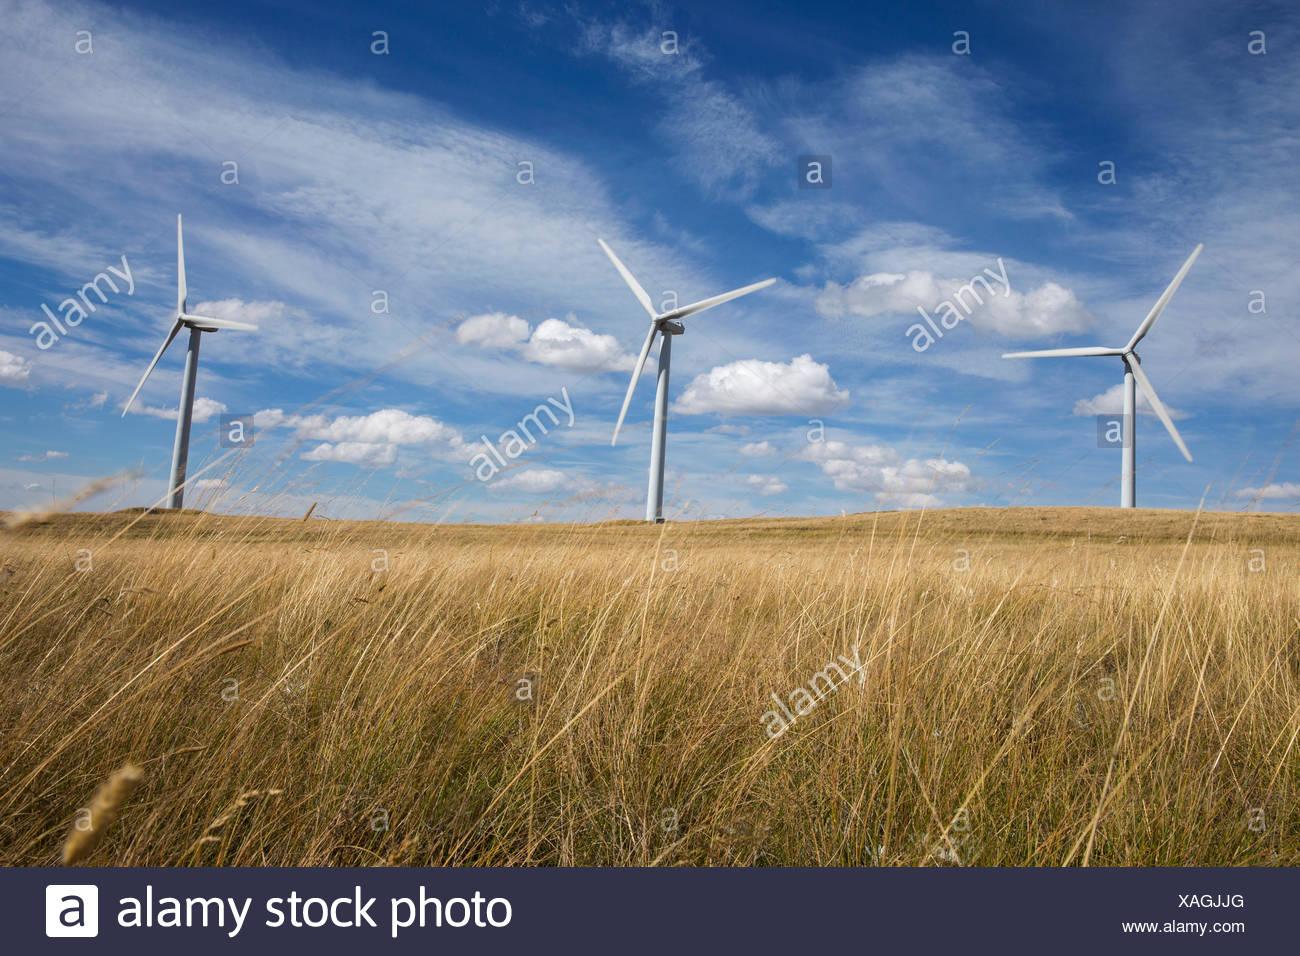 Wind turbines in sunny rural field - Stock Image